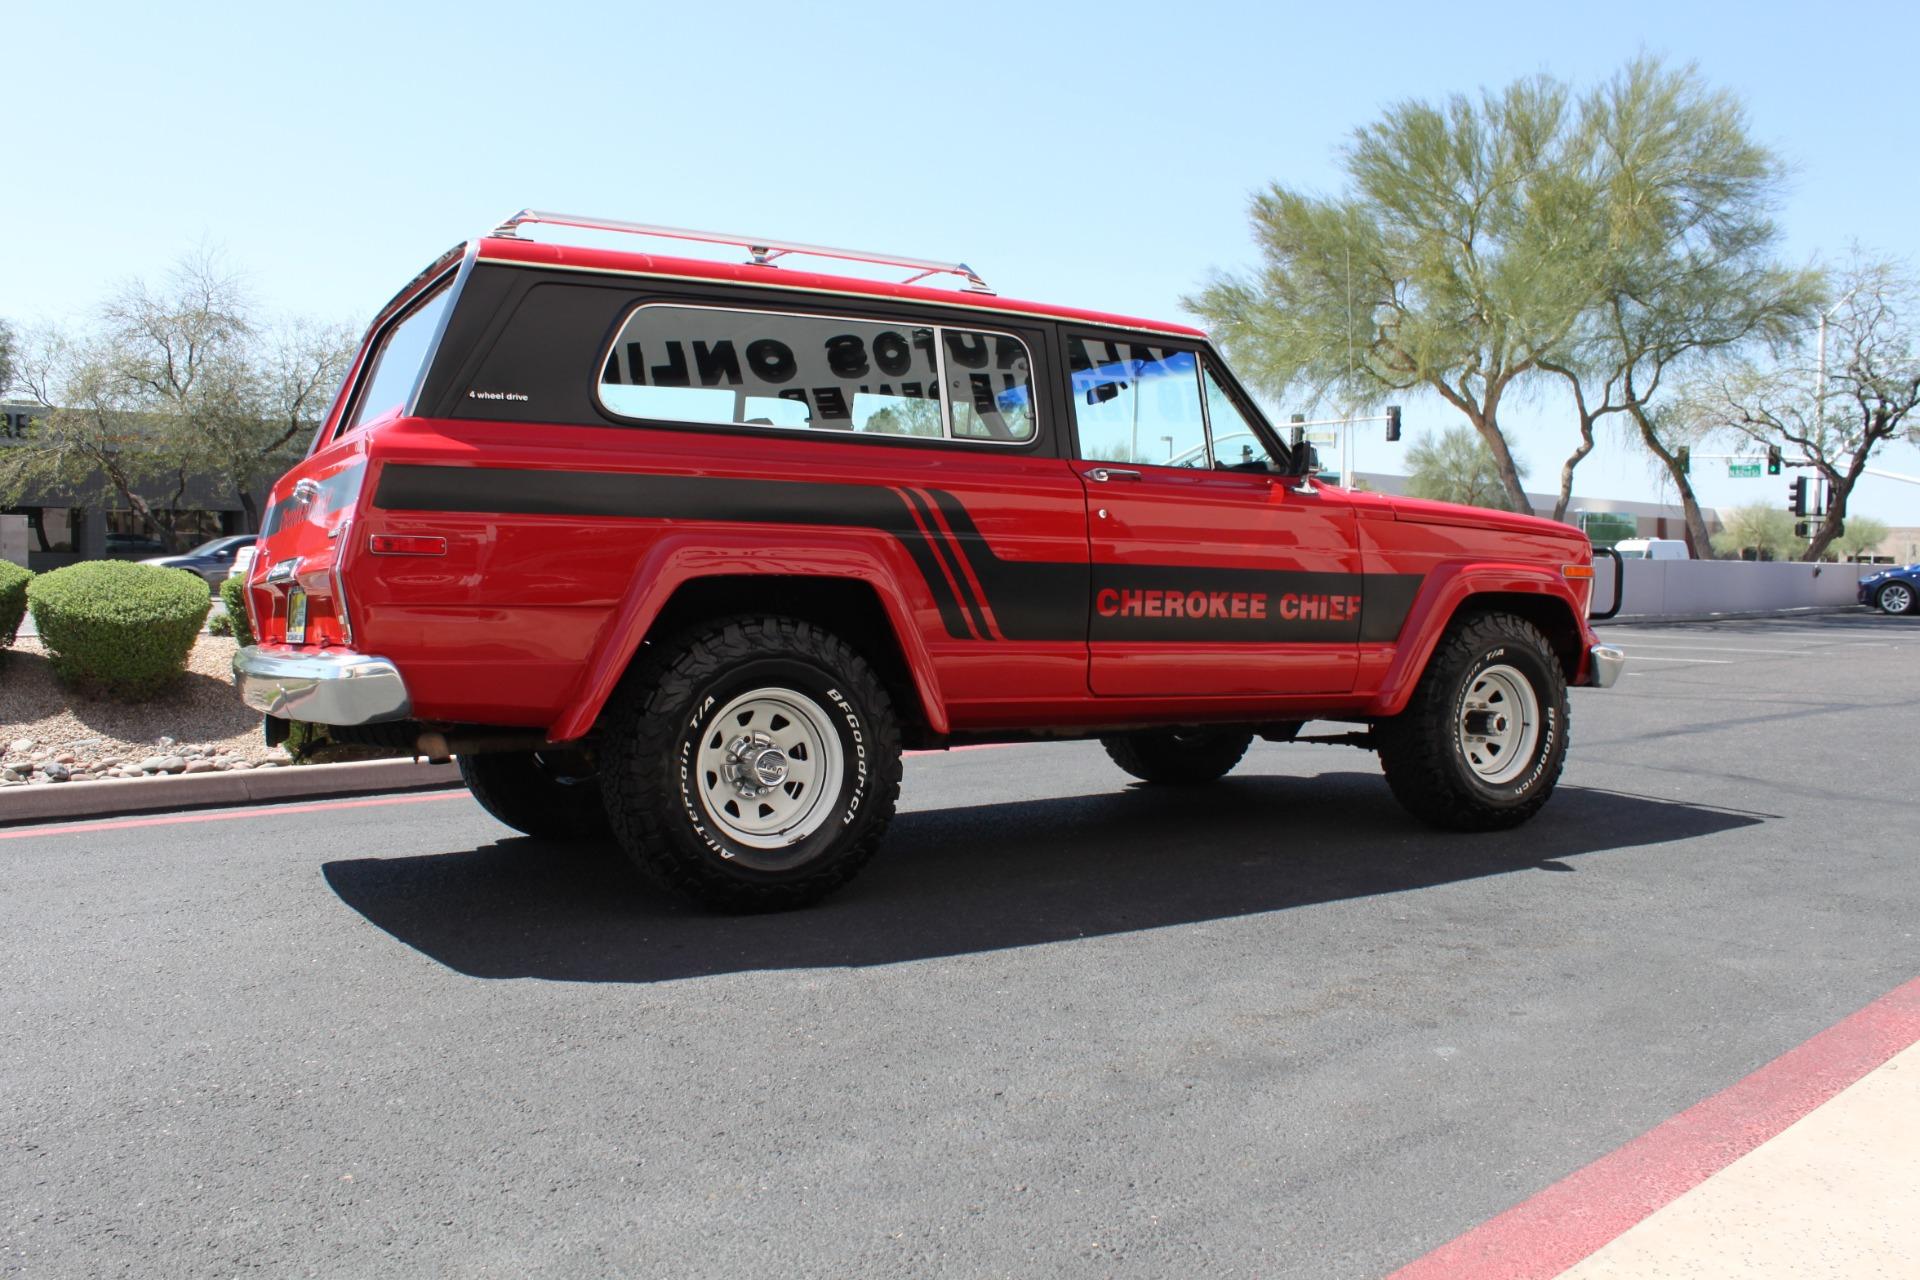 Used-1983-Jeep-Cherokee-4WD-Chief-Dodge